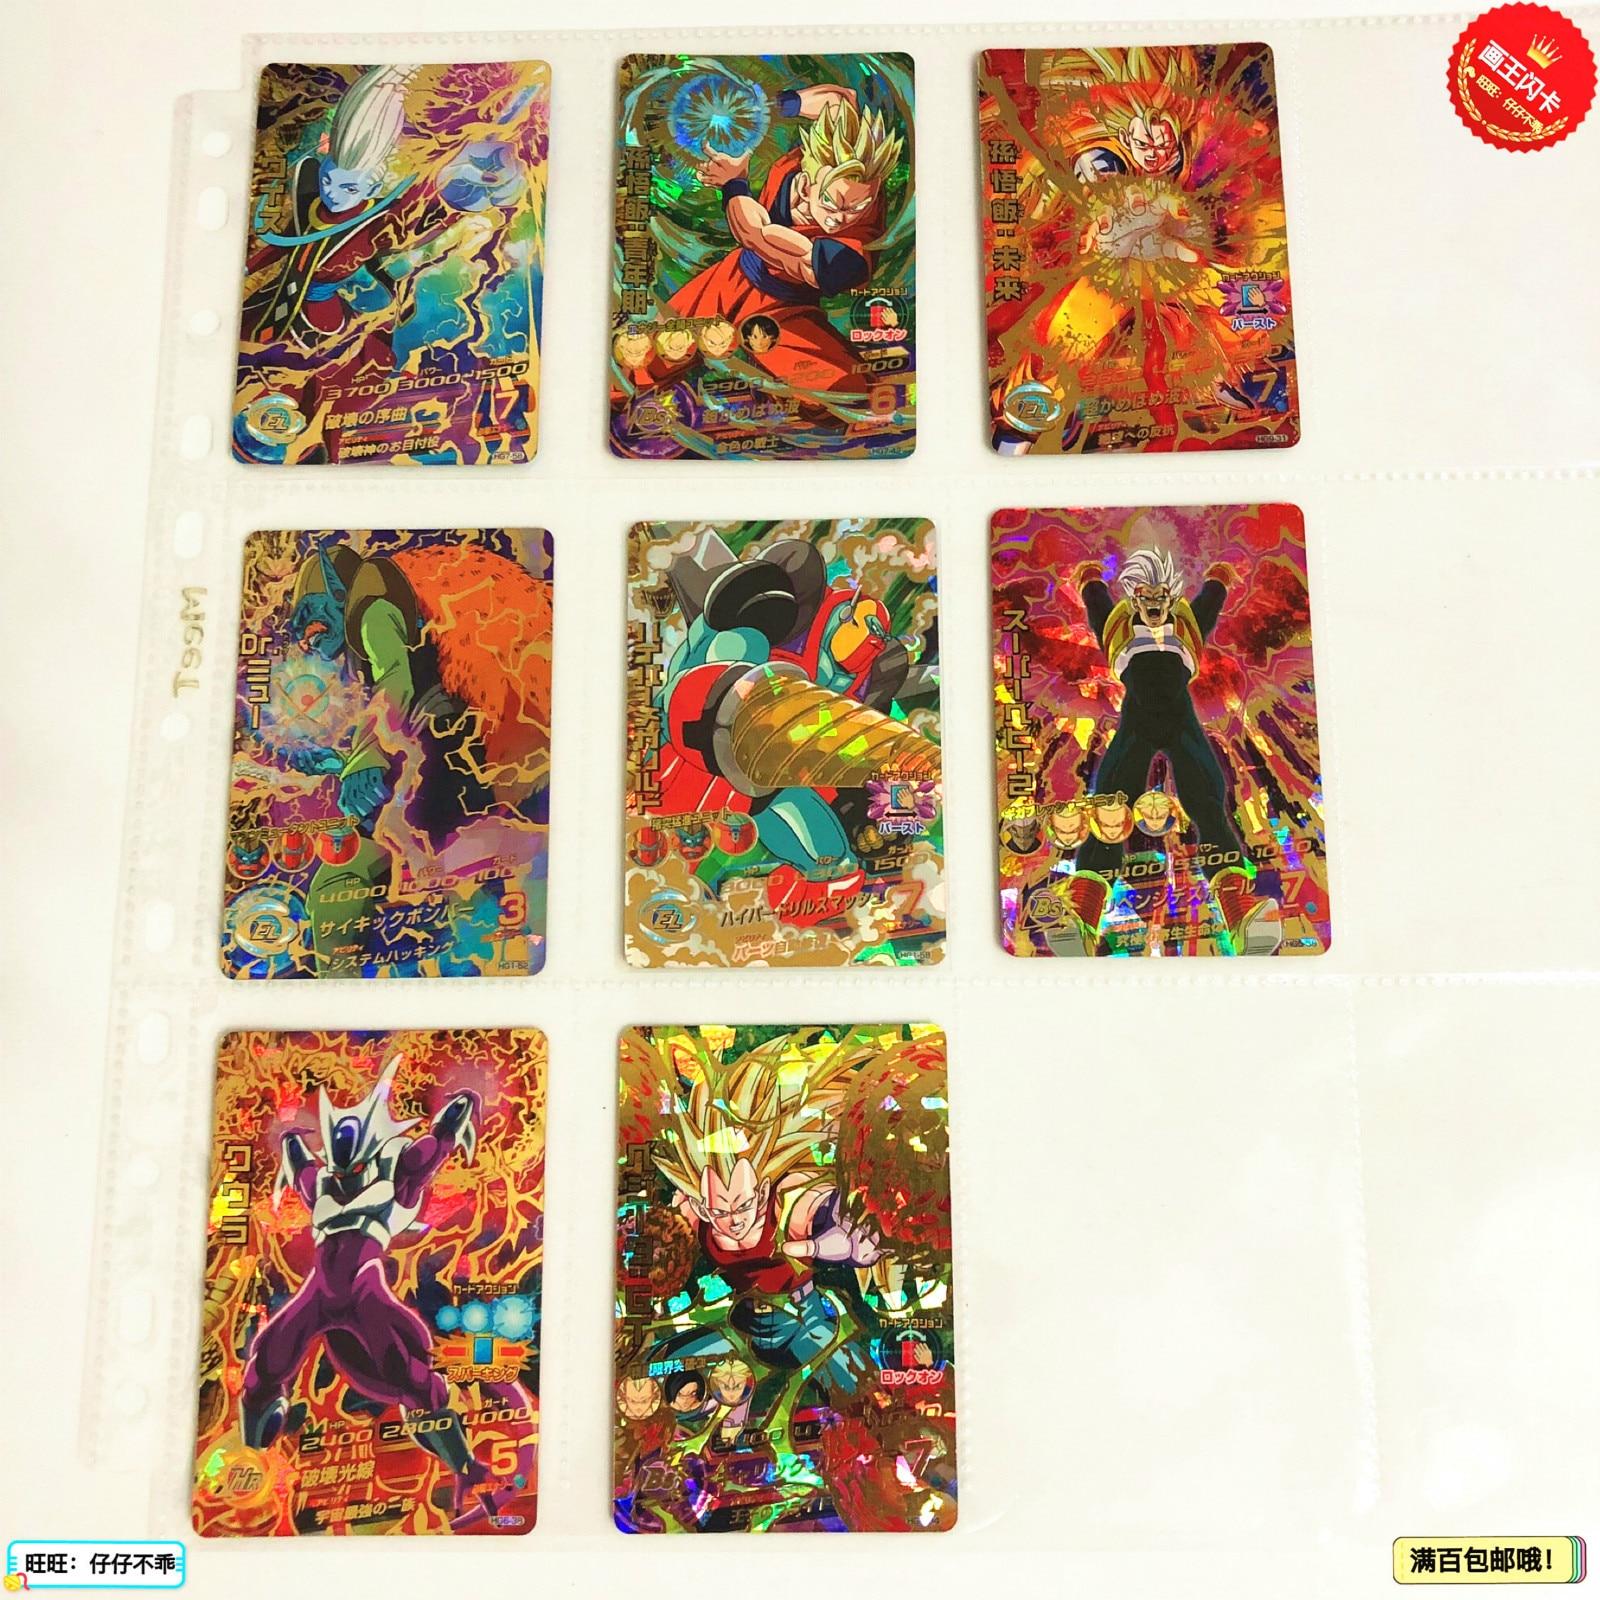 Japan Original Dragon Ball Hero Card SEC 4 Stars HG Goku Toys Hobbies Collectibles Game Collection Anime Cards